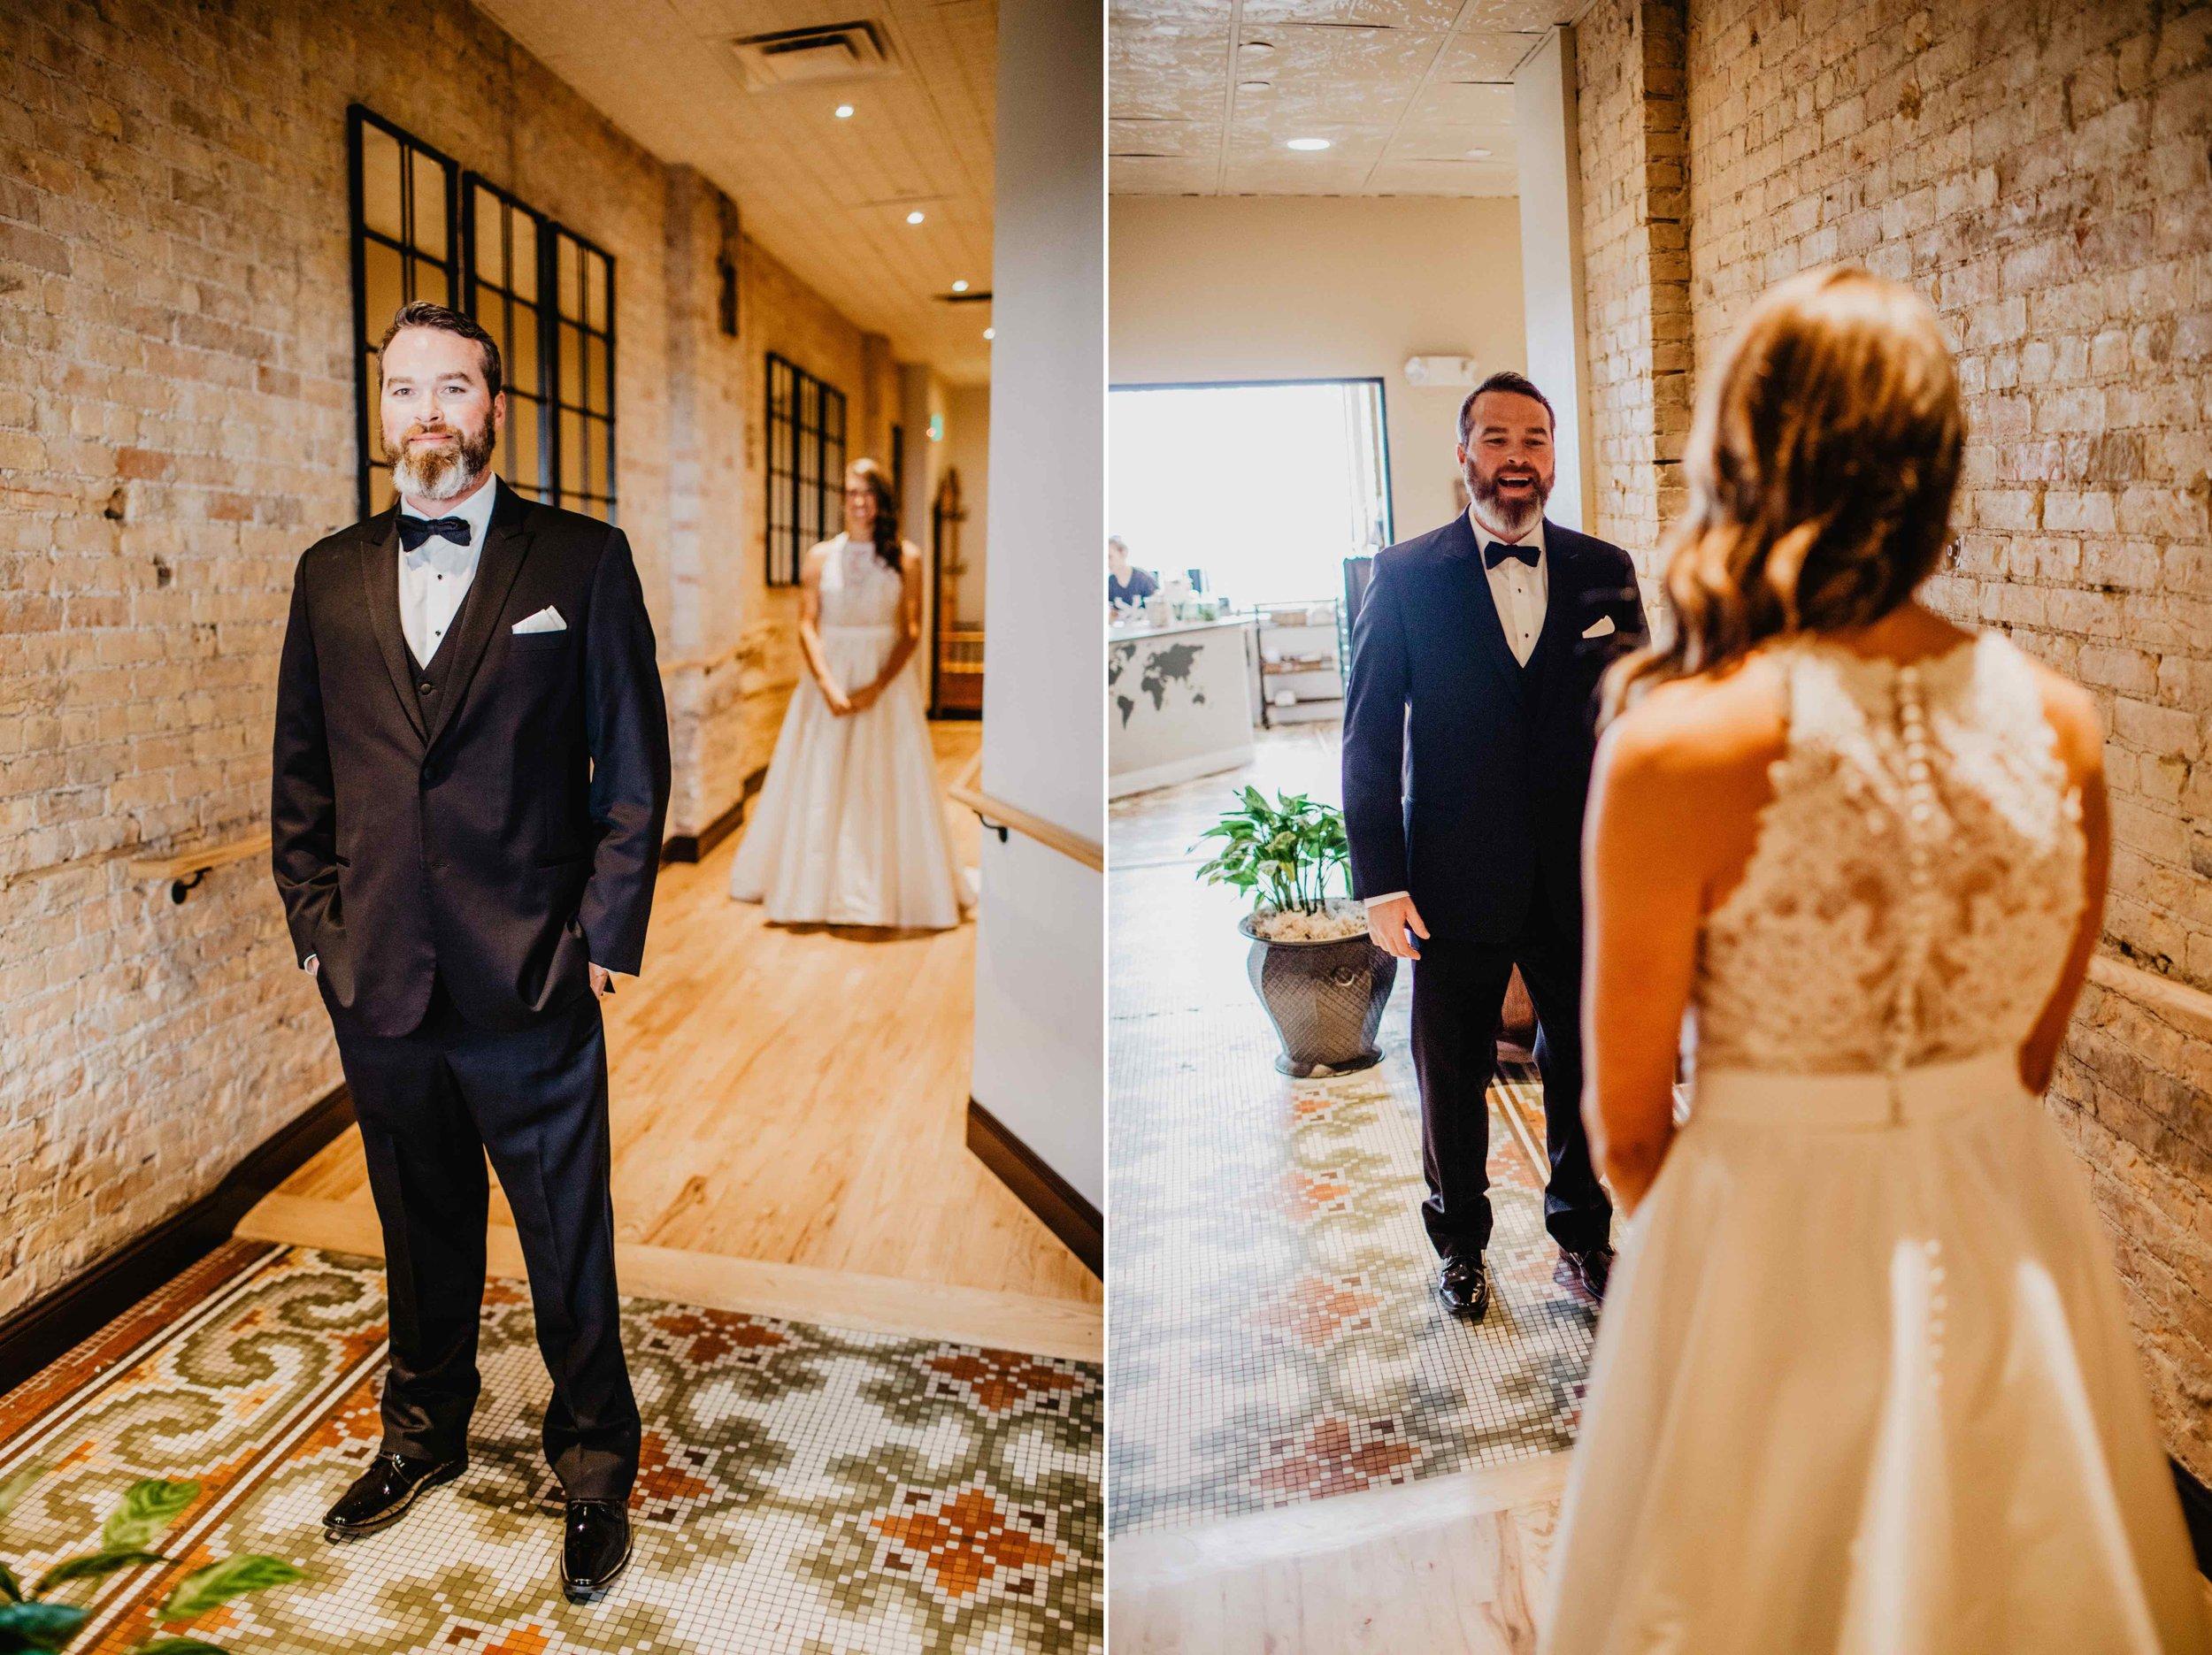 Kisa Conrad Favorites-0019-colorado-wedding-photographer-denver-springs-vailhotel-glenwood-springs-colorado-wedding-photographer.jpeg